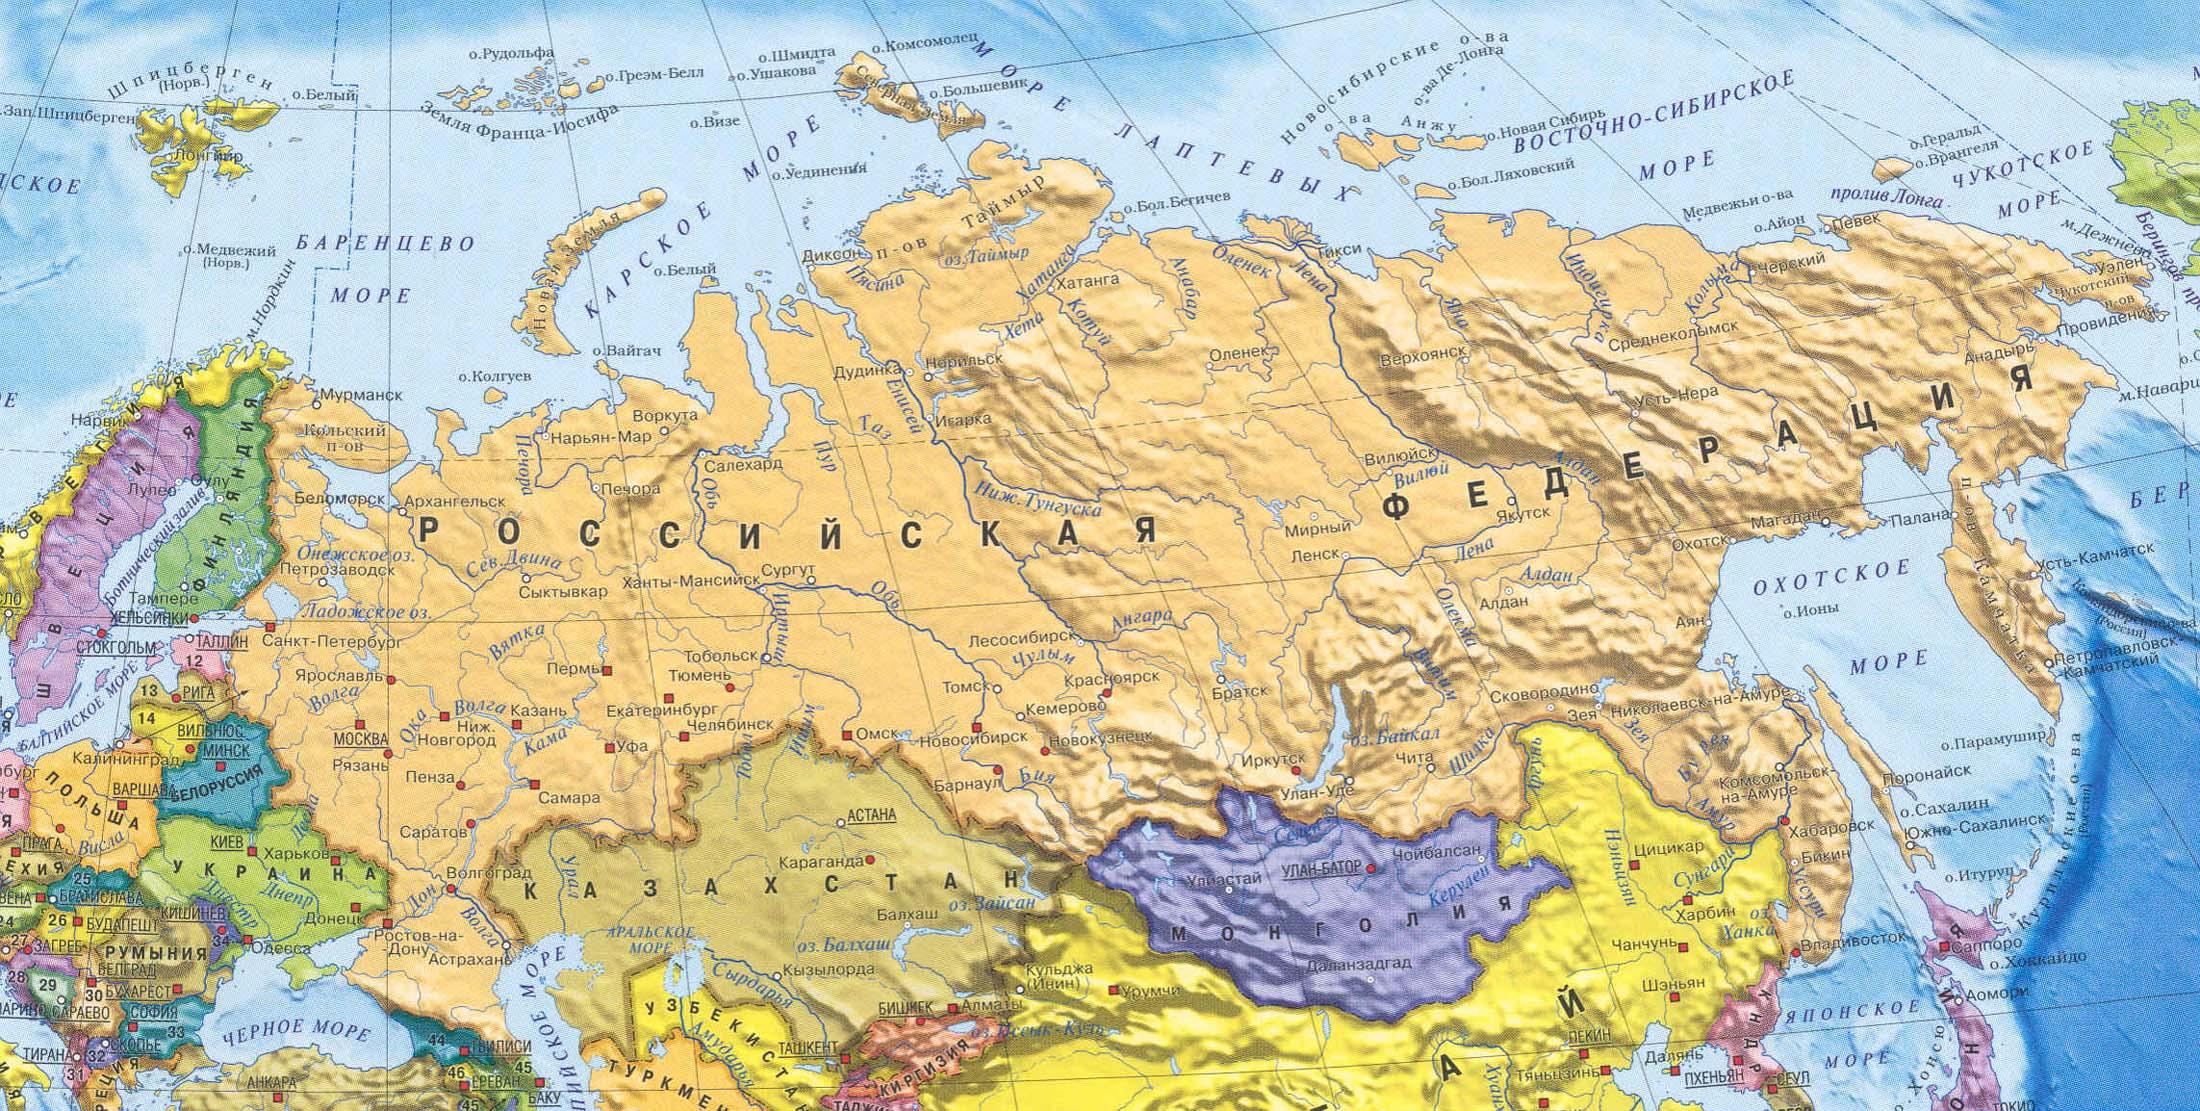 D:\выступление на РМО\map_russia.jpg